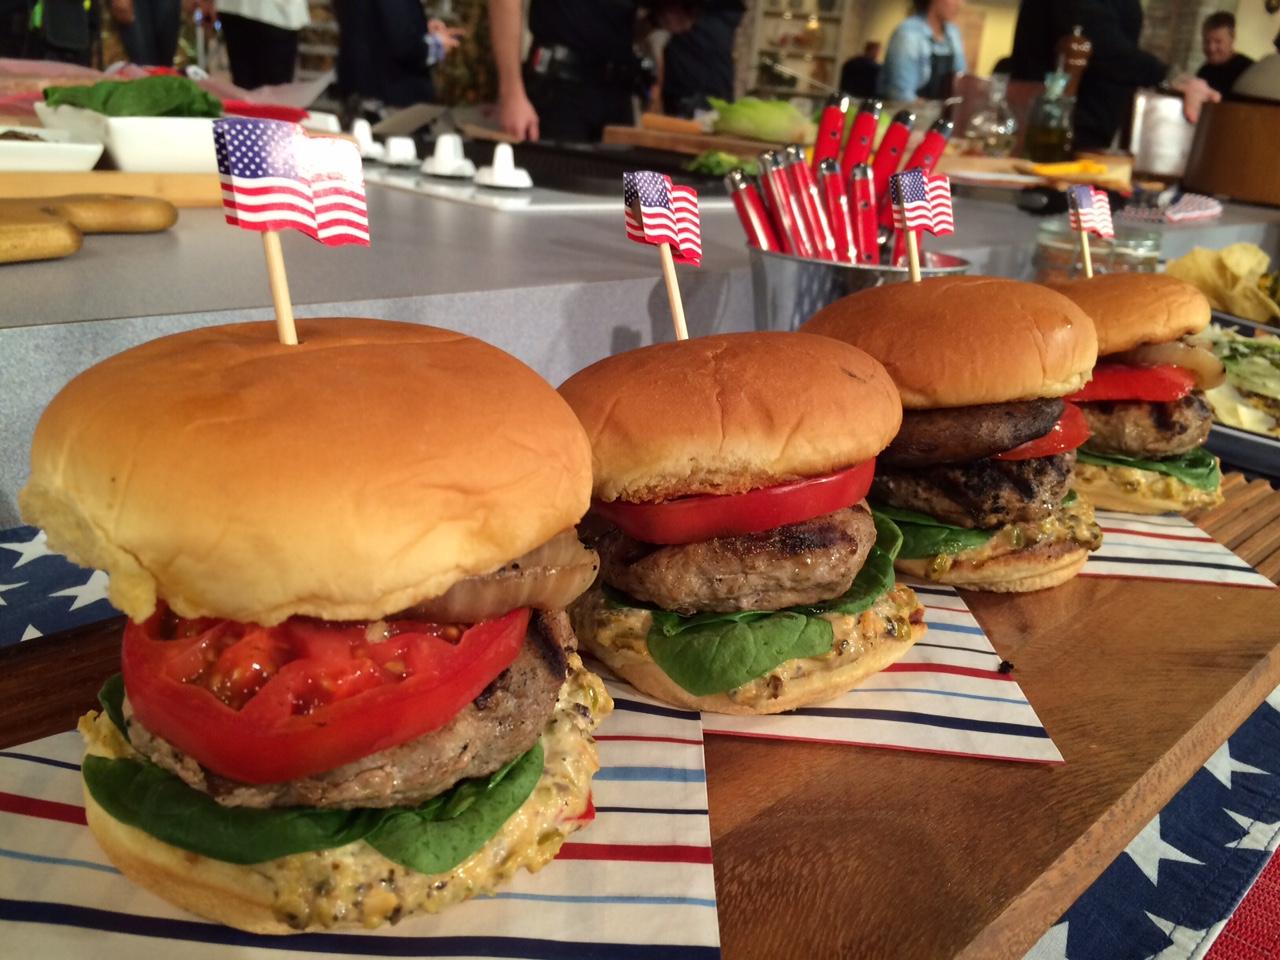 David Guas taught us to make some healthy burgers